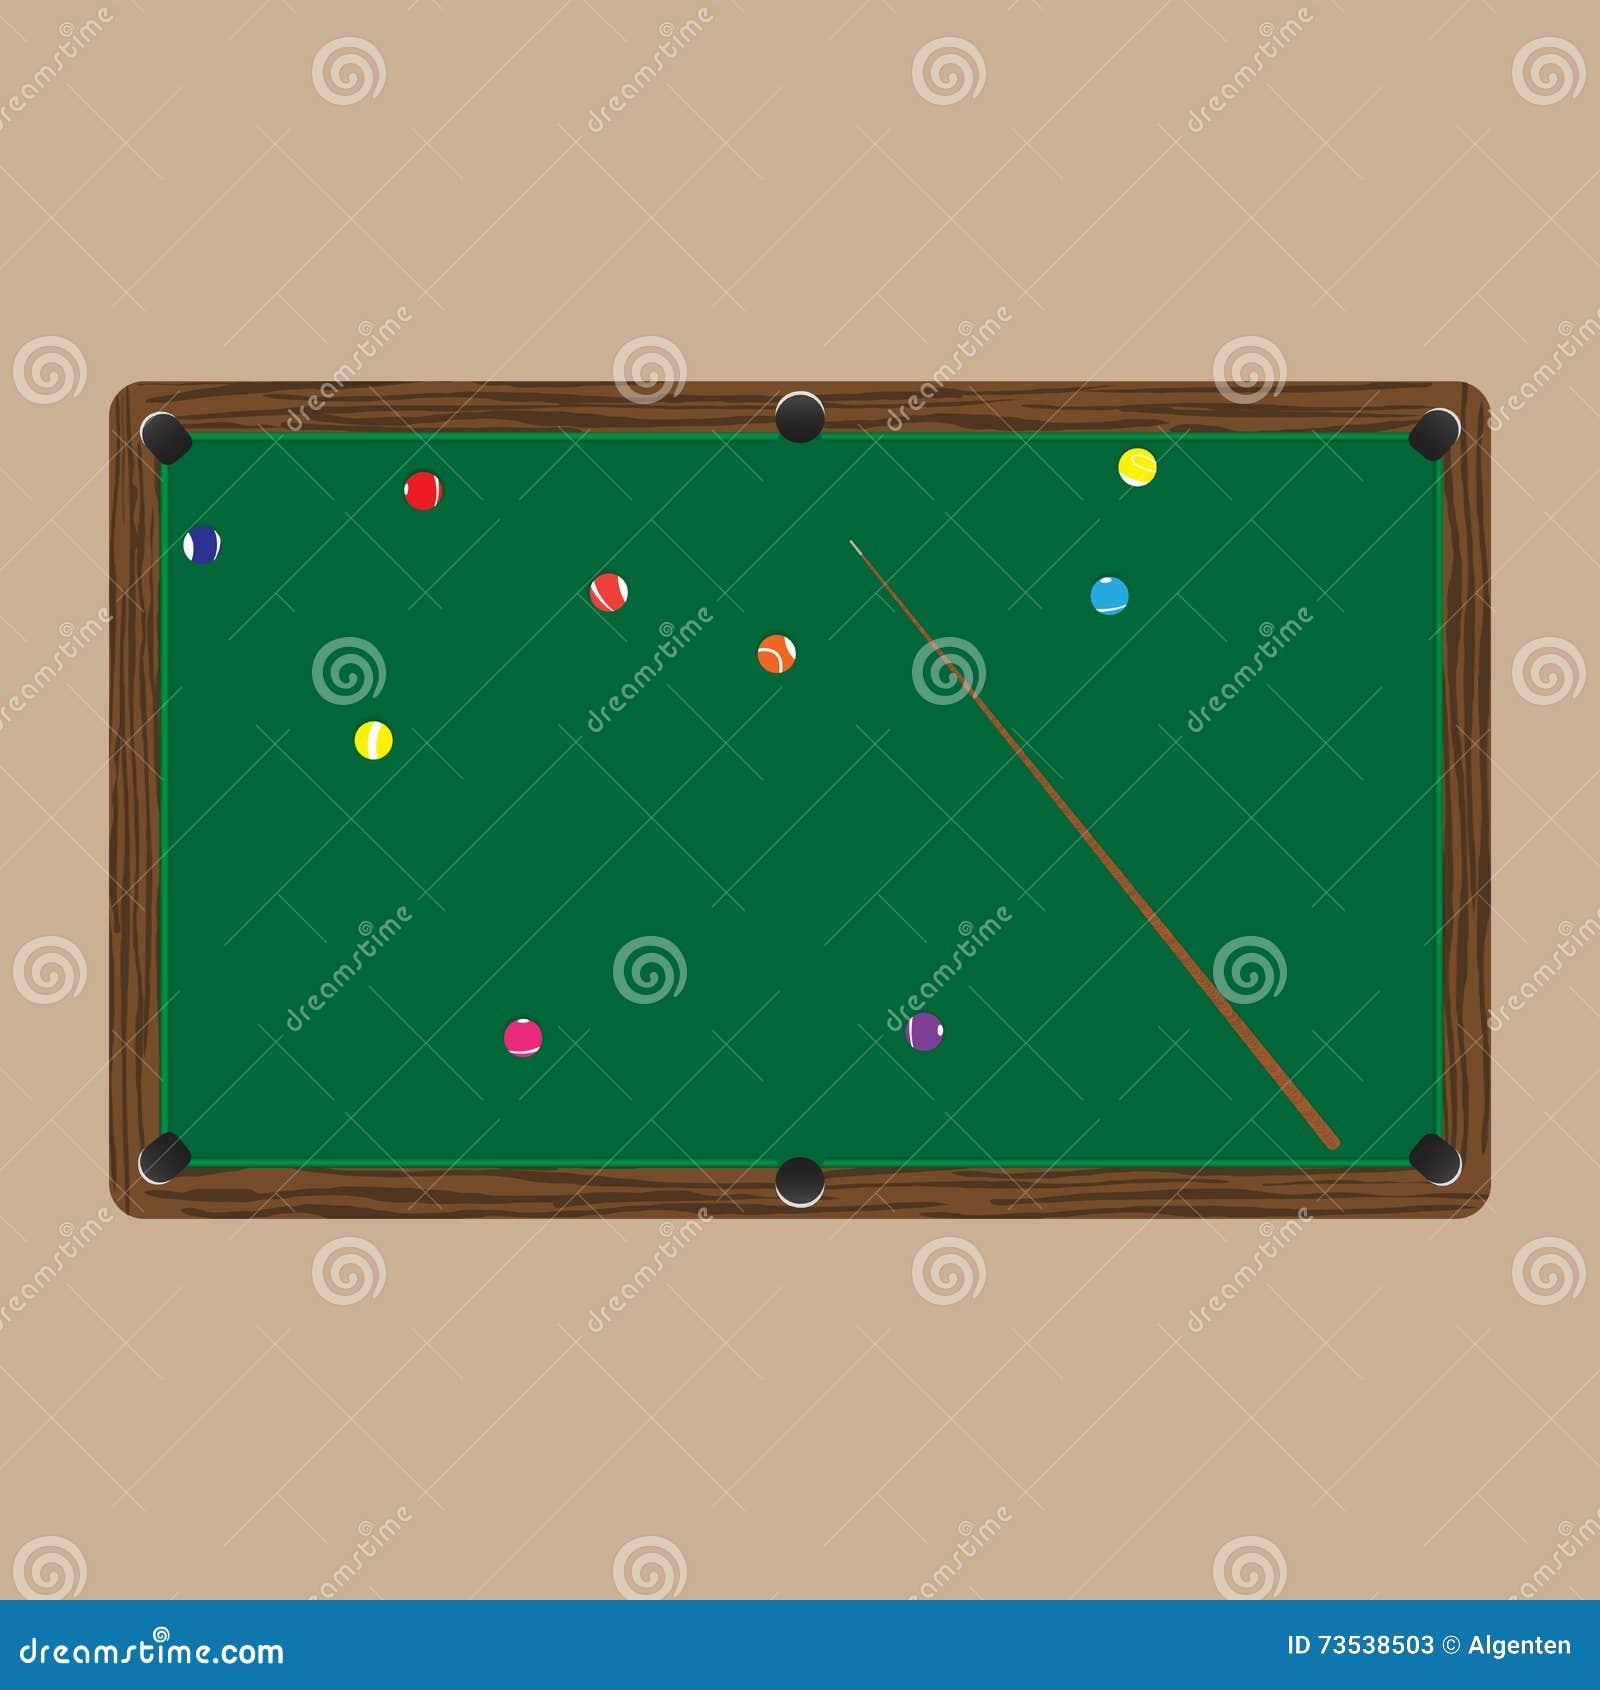 Green Room Billiards